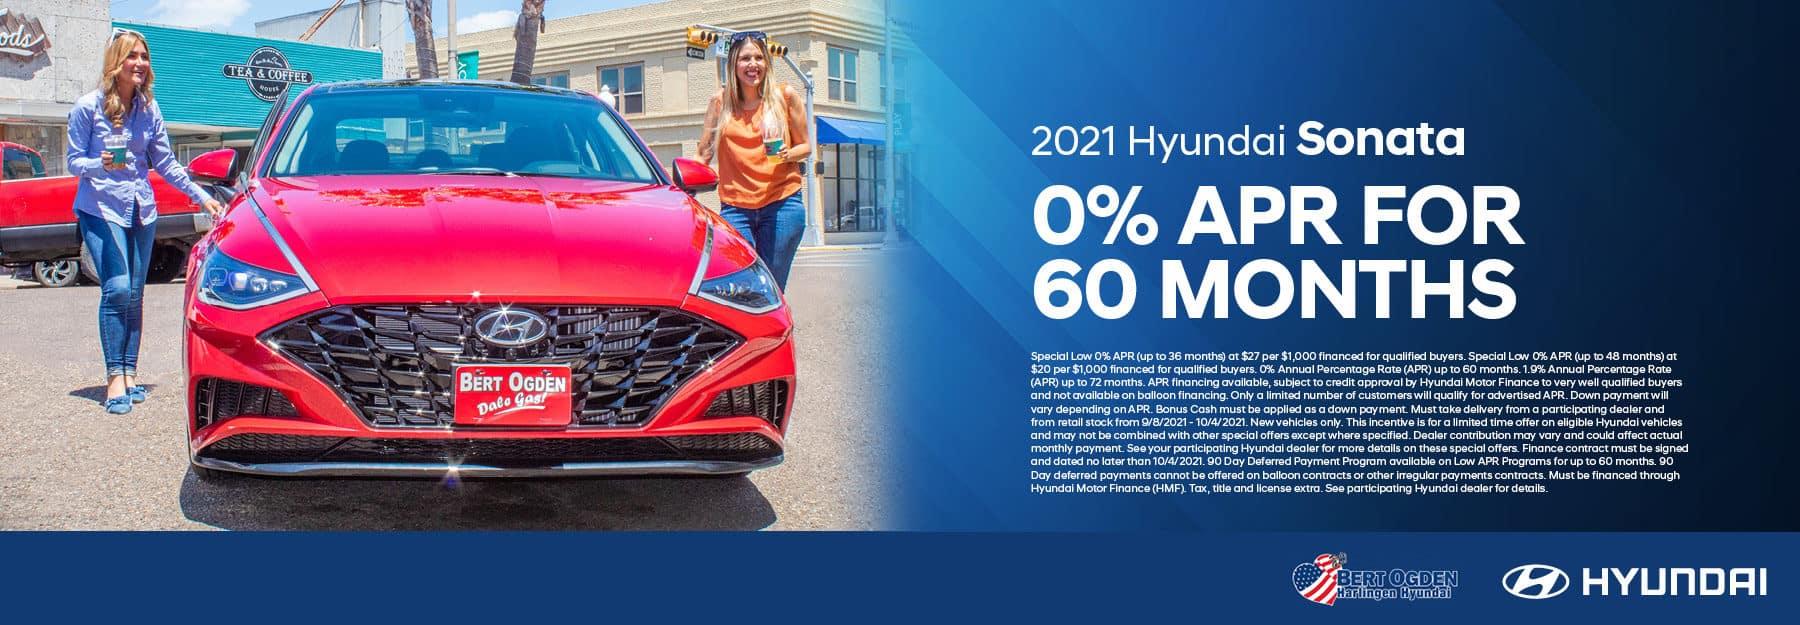 2021 Hyundai Sonata Offer   Bert Ogden Hyundai in Harlingen, Texas